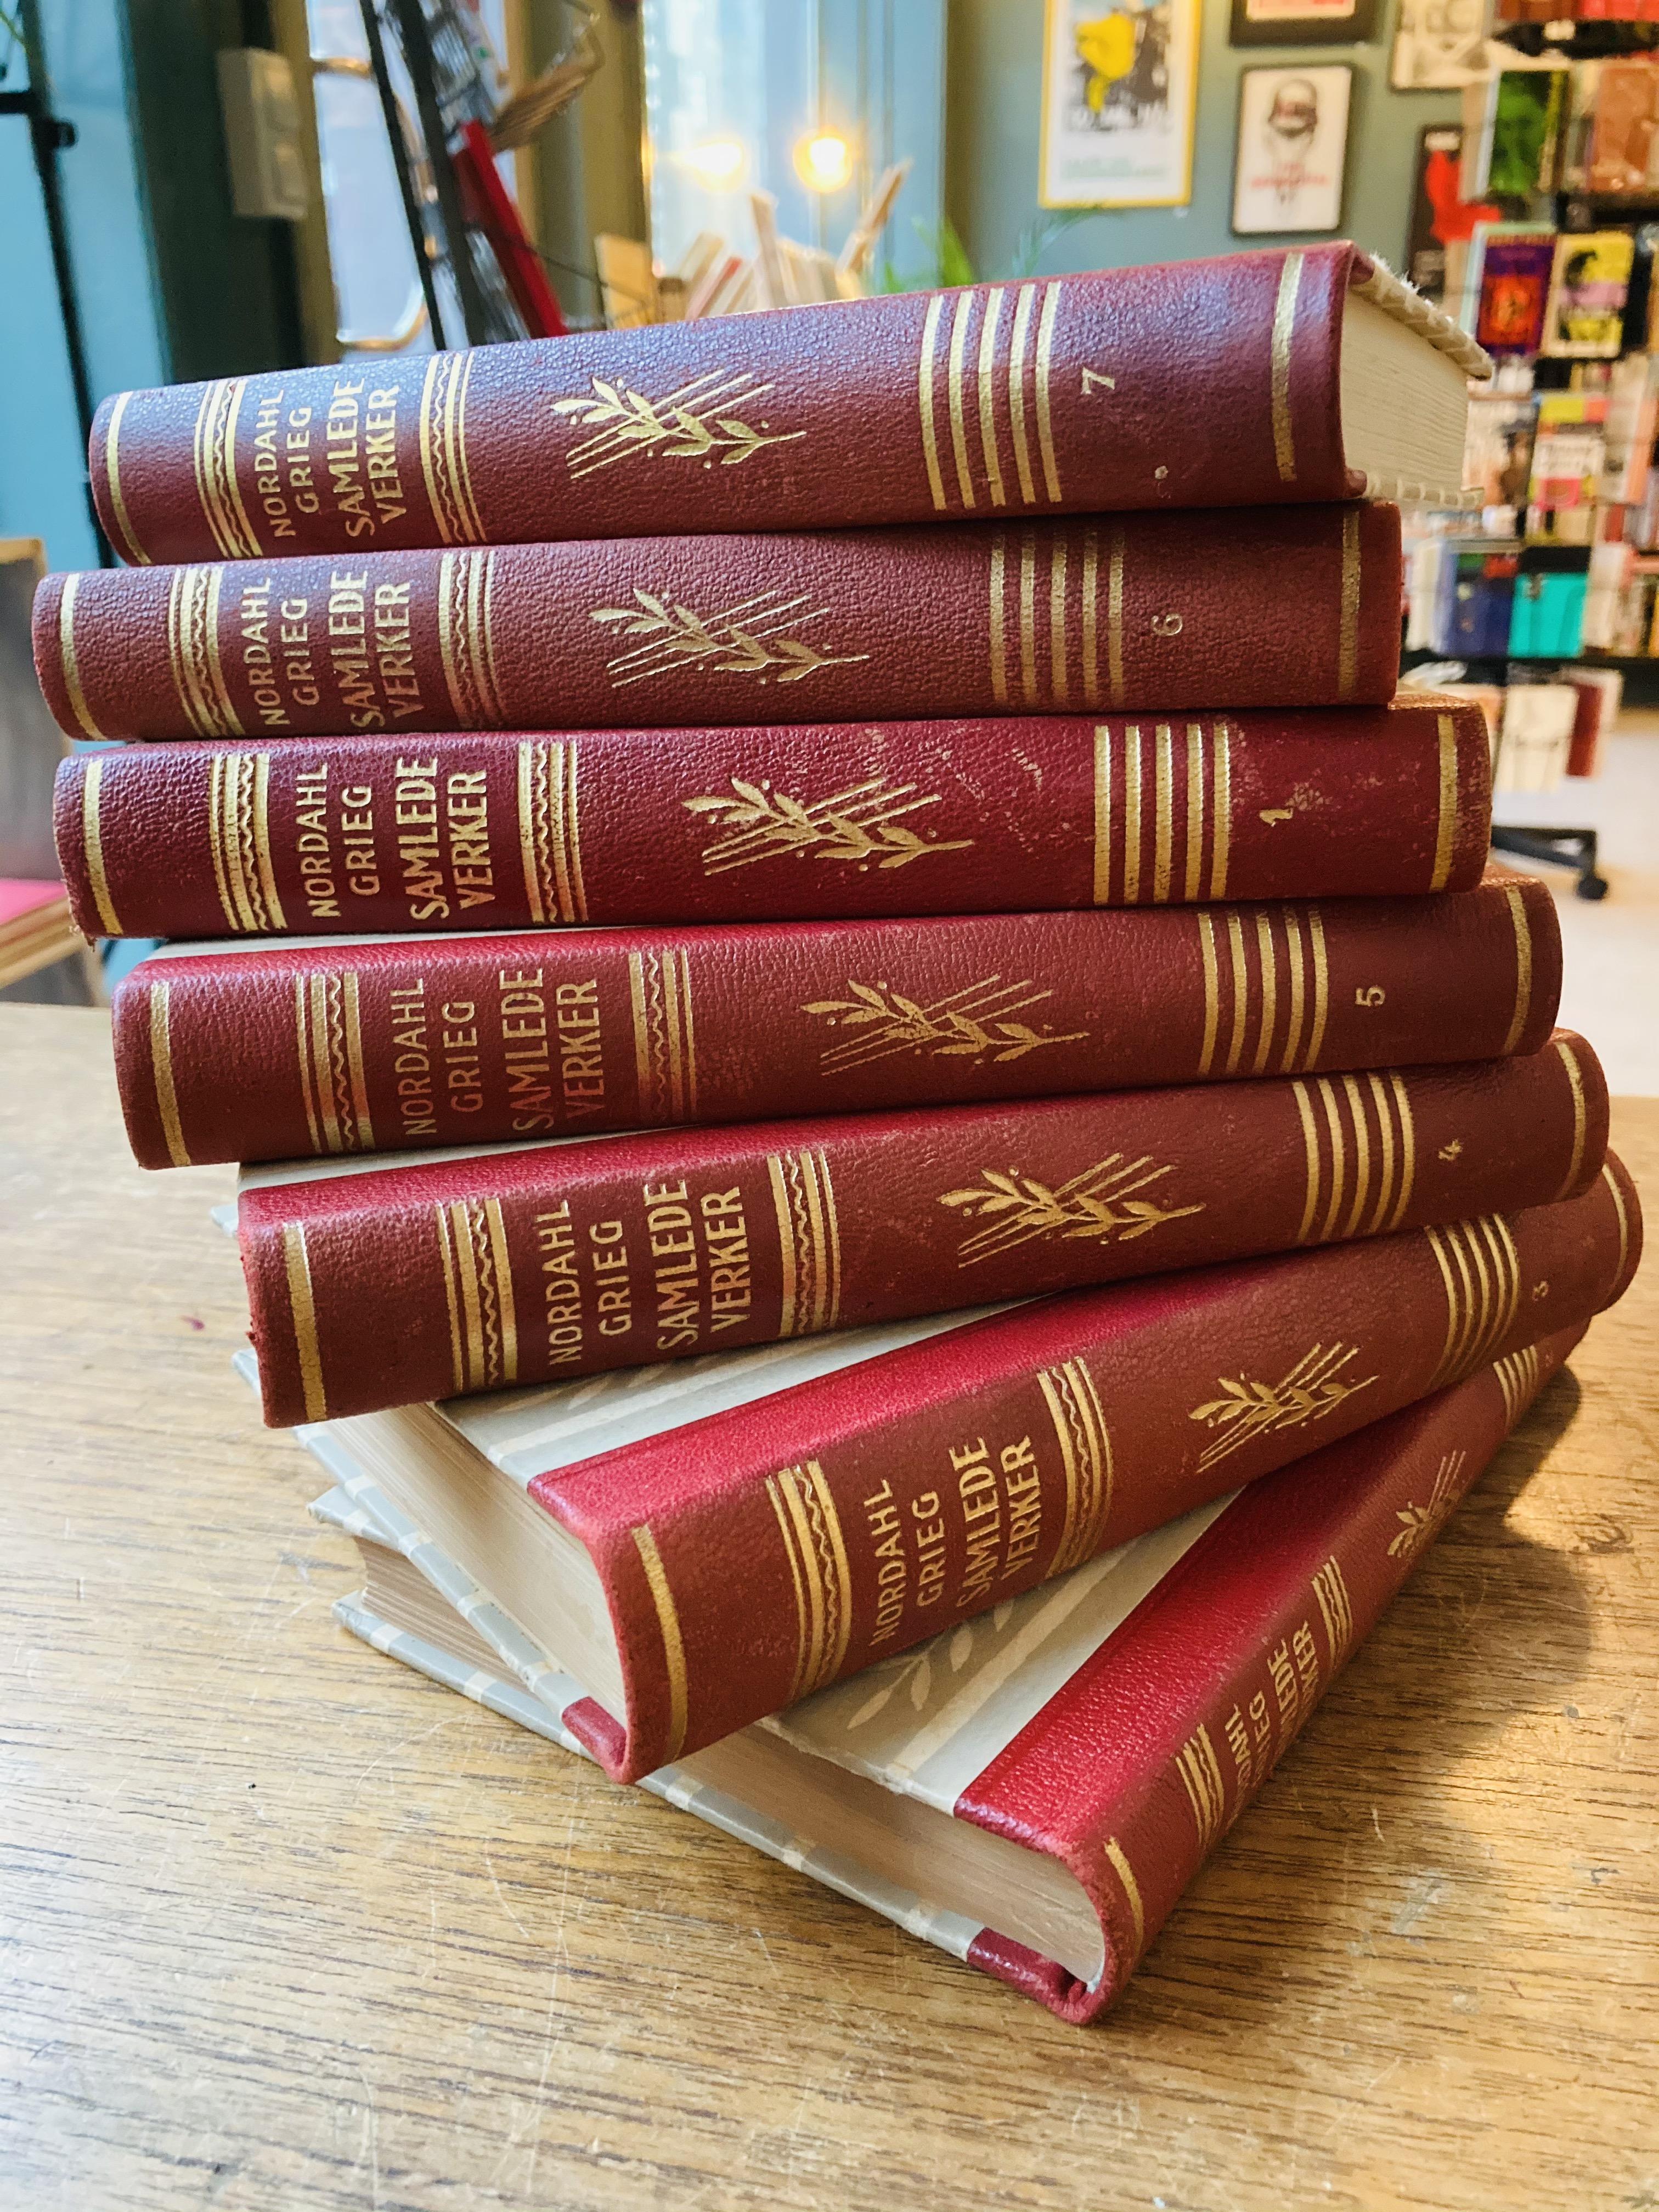 Nordahl Grieg: Samlede verker - Bind I-VII